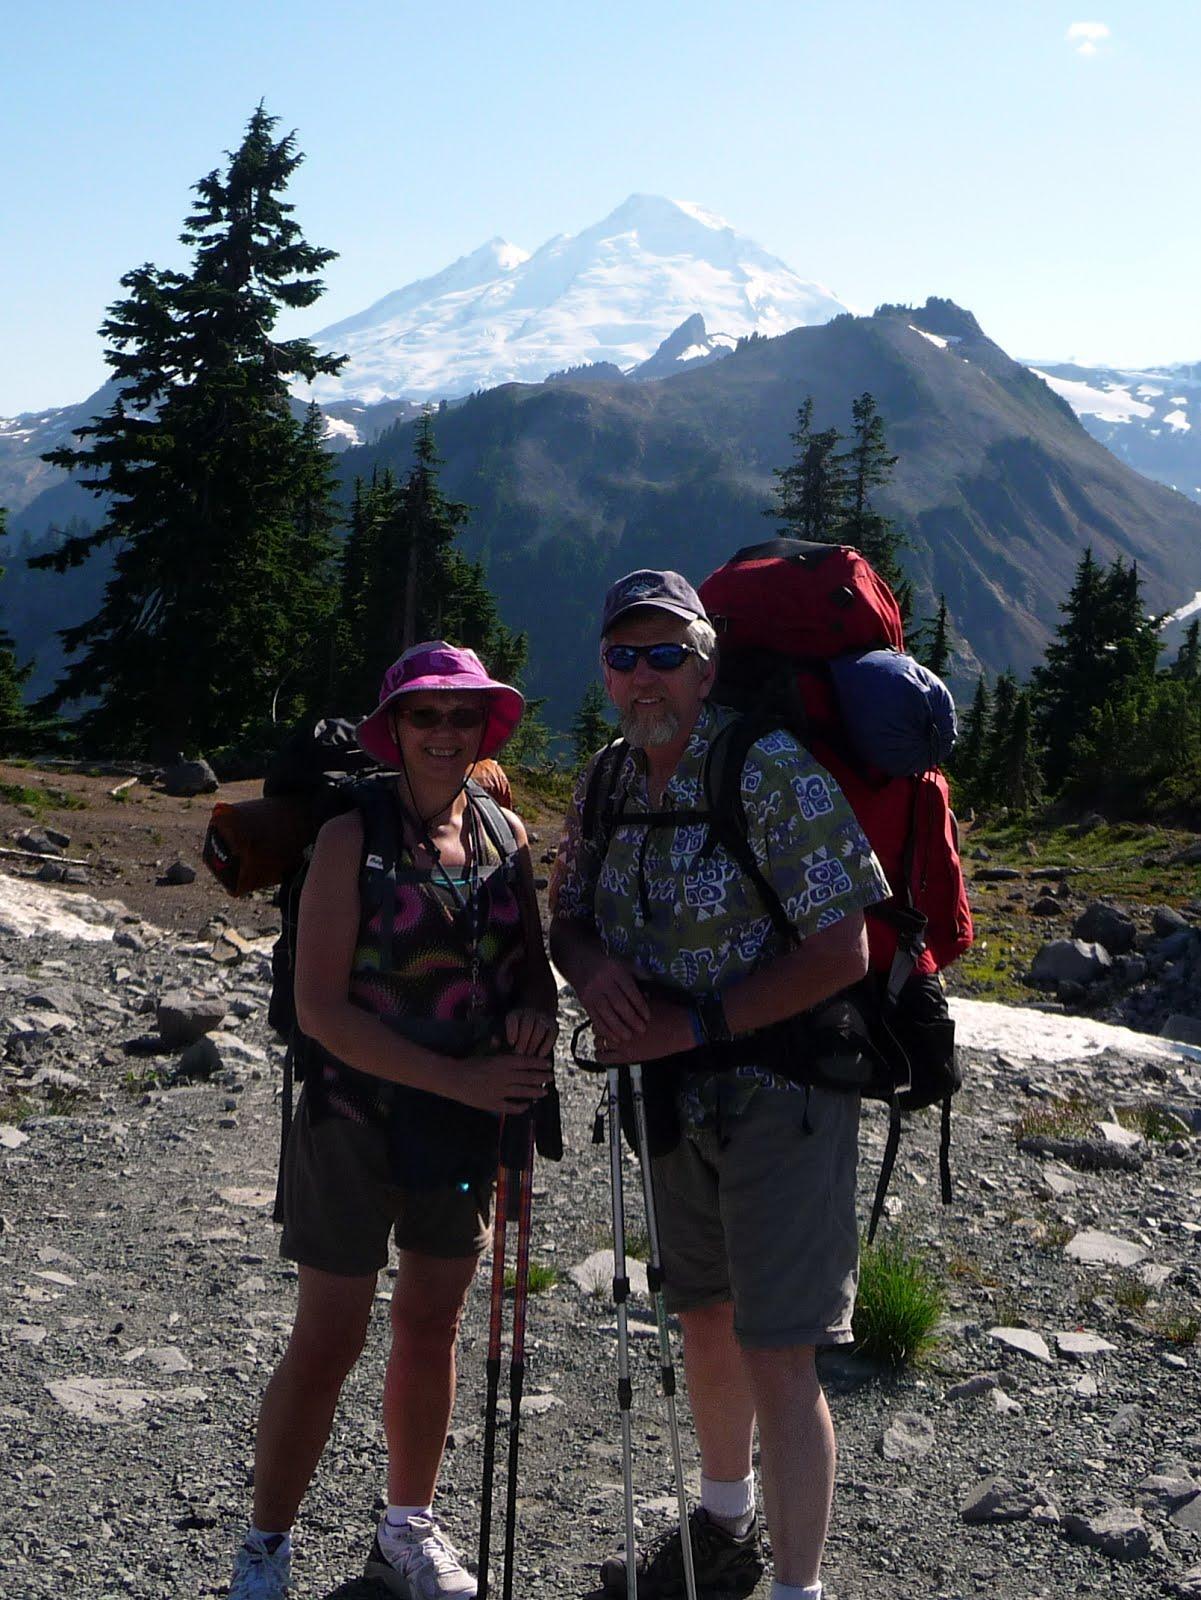 The Love-Burkes go hiking